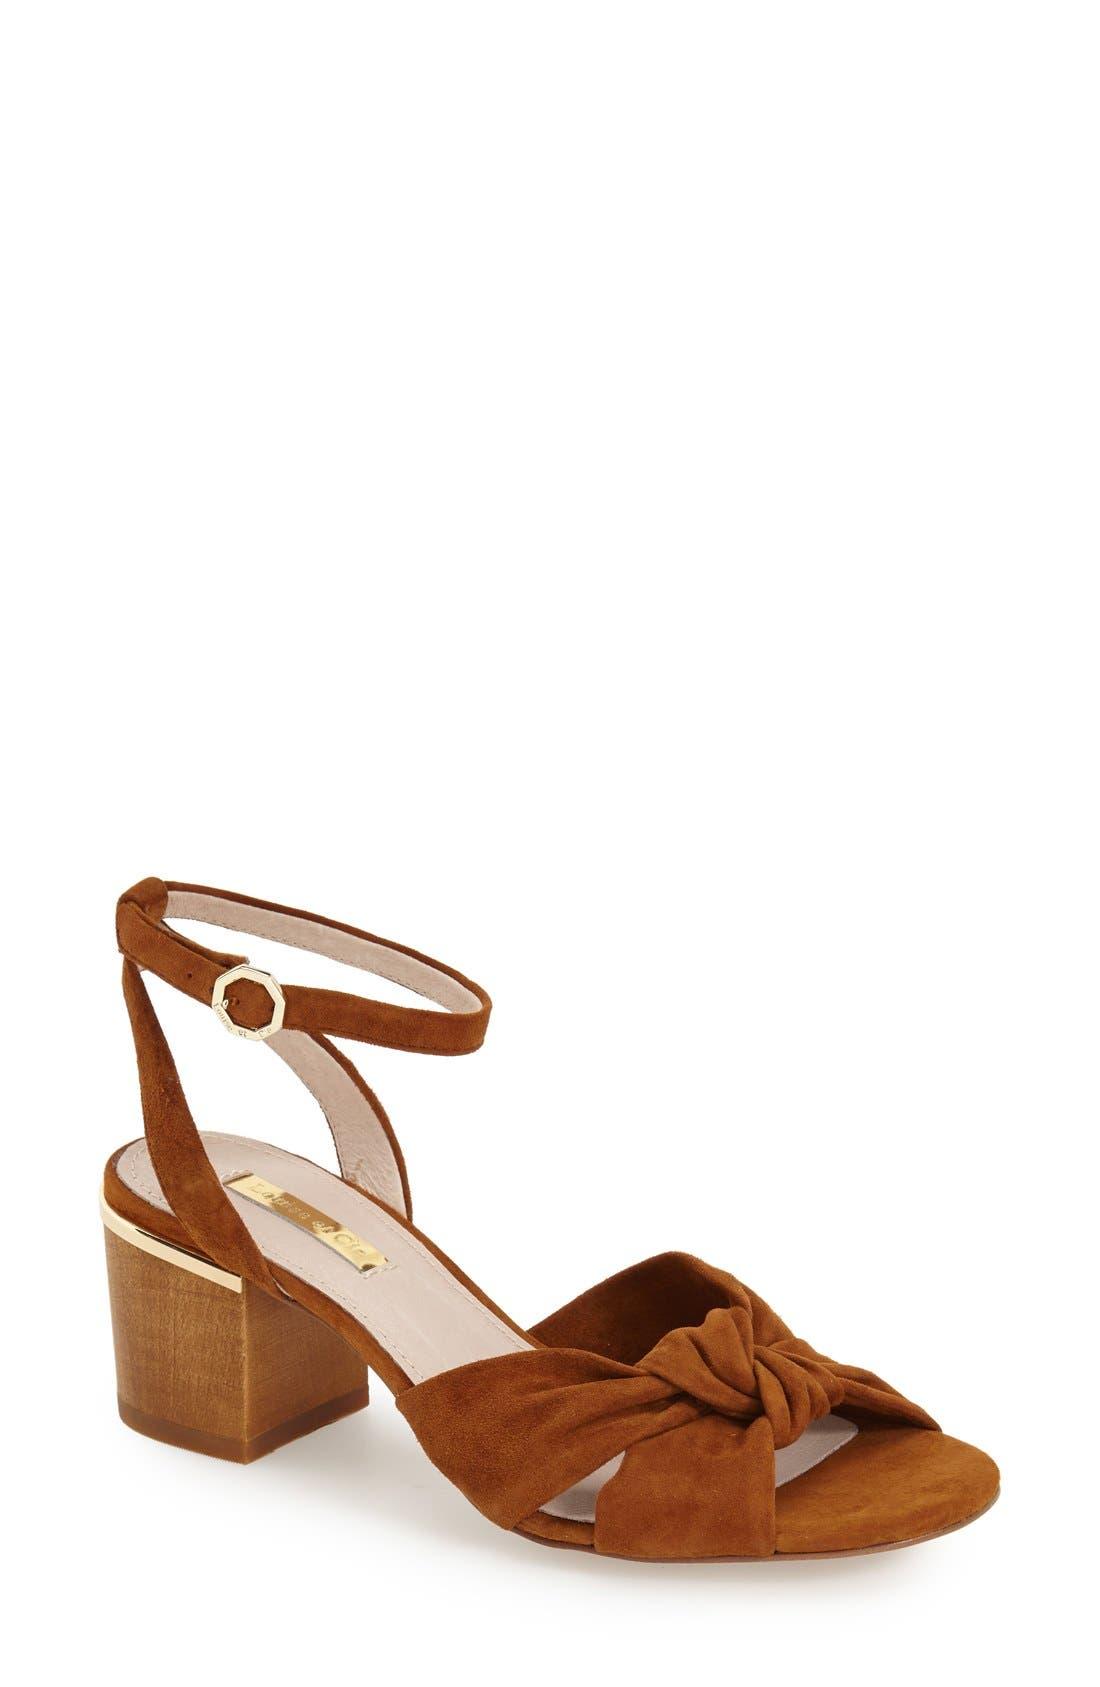 'Genna City' Sandal,                         Main,                         color, Yam Suede